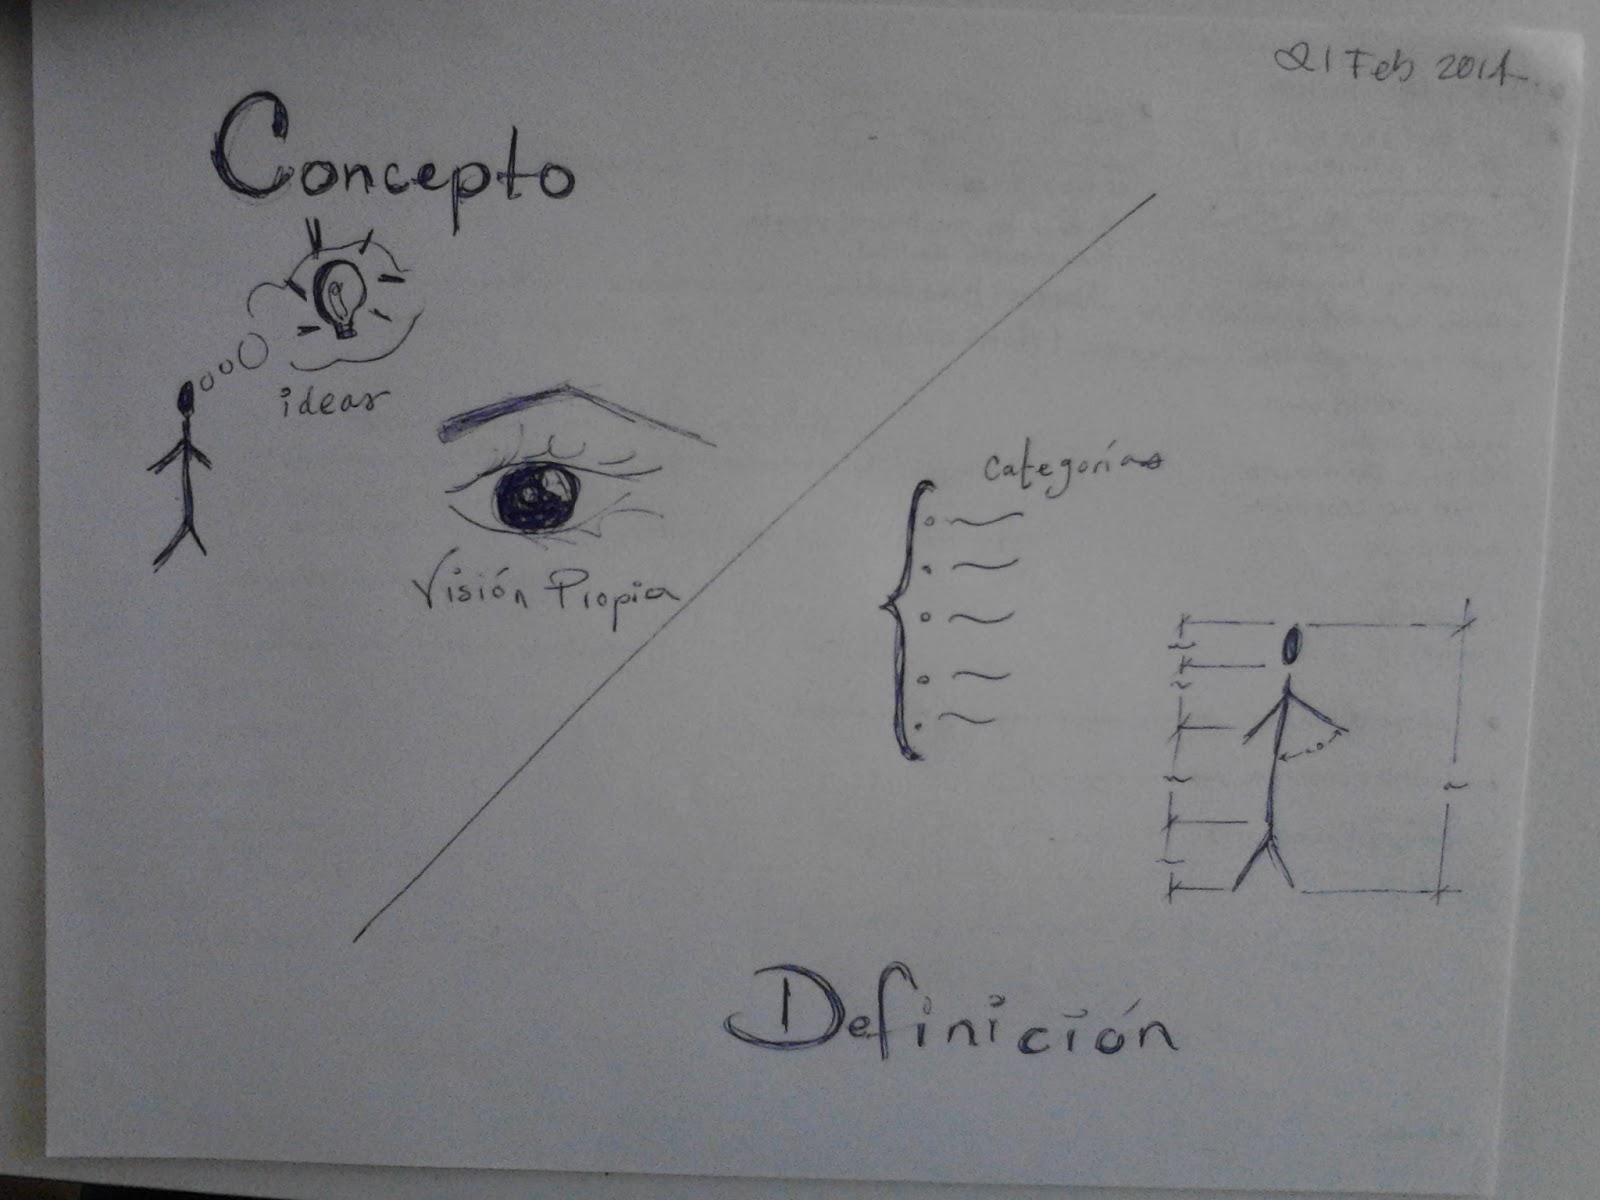 Teor a introducci n a la arquitectura concepto y for Arte arquitectura definicion